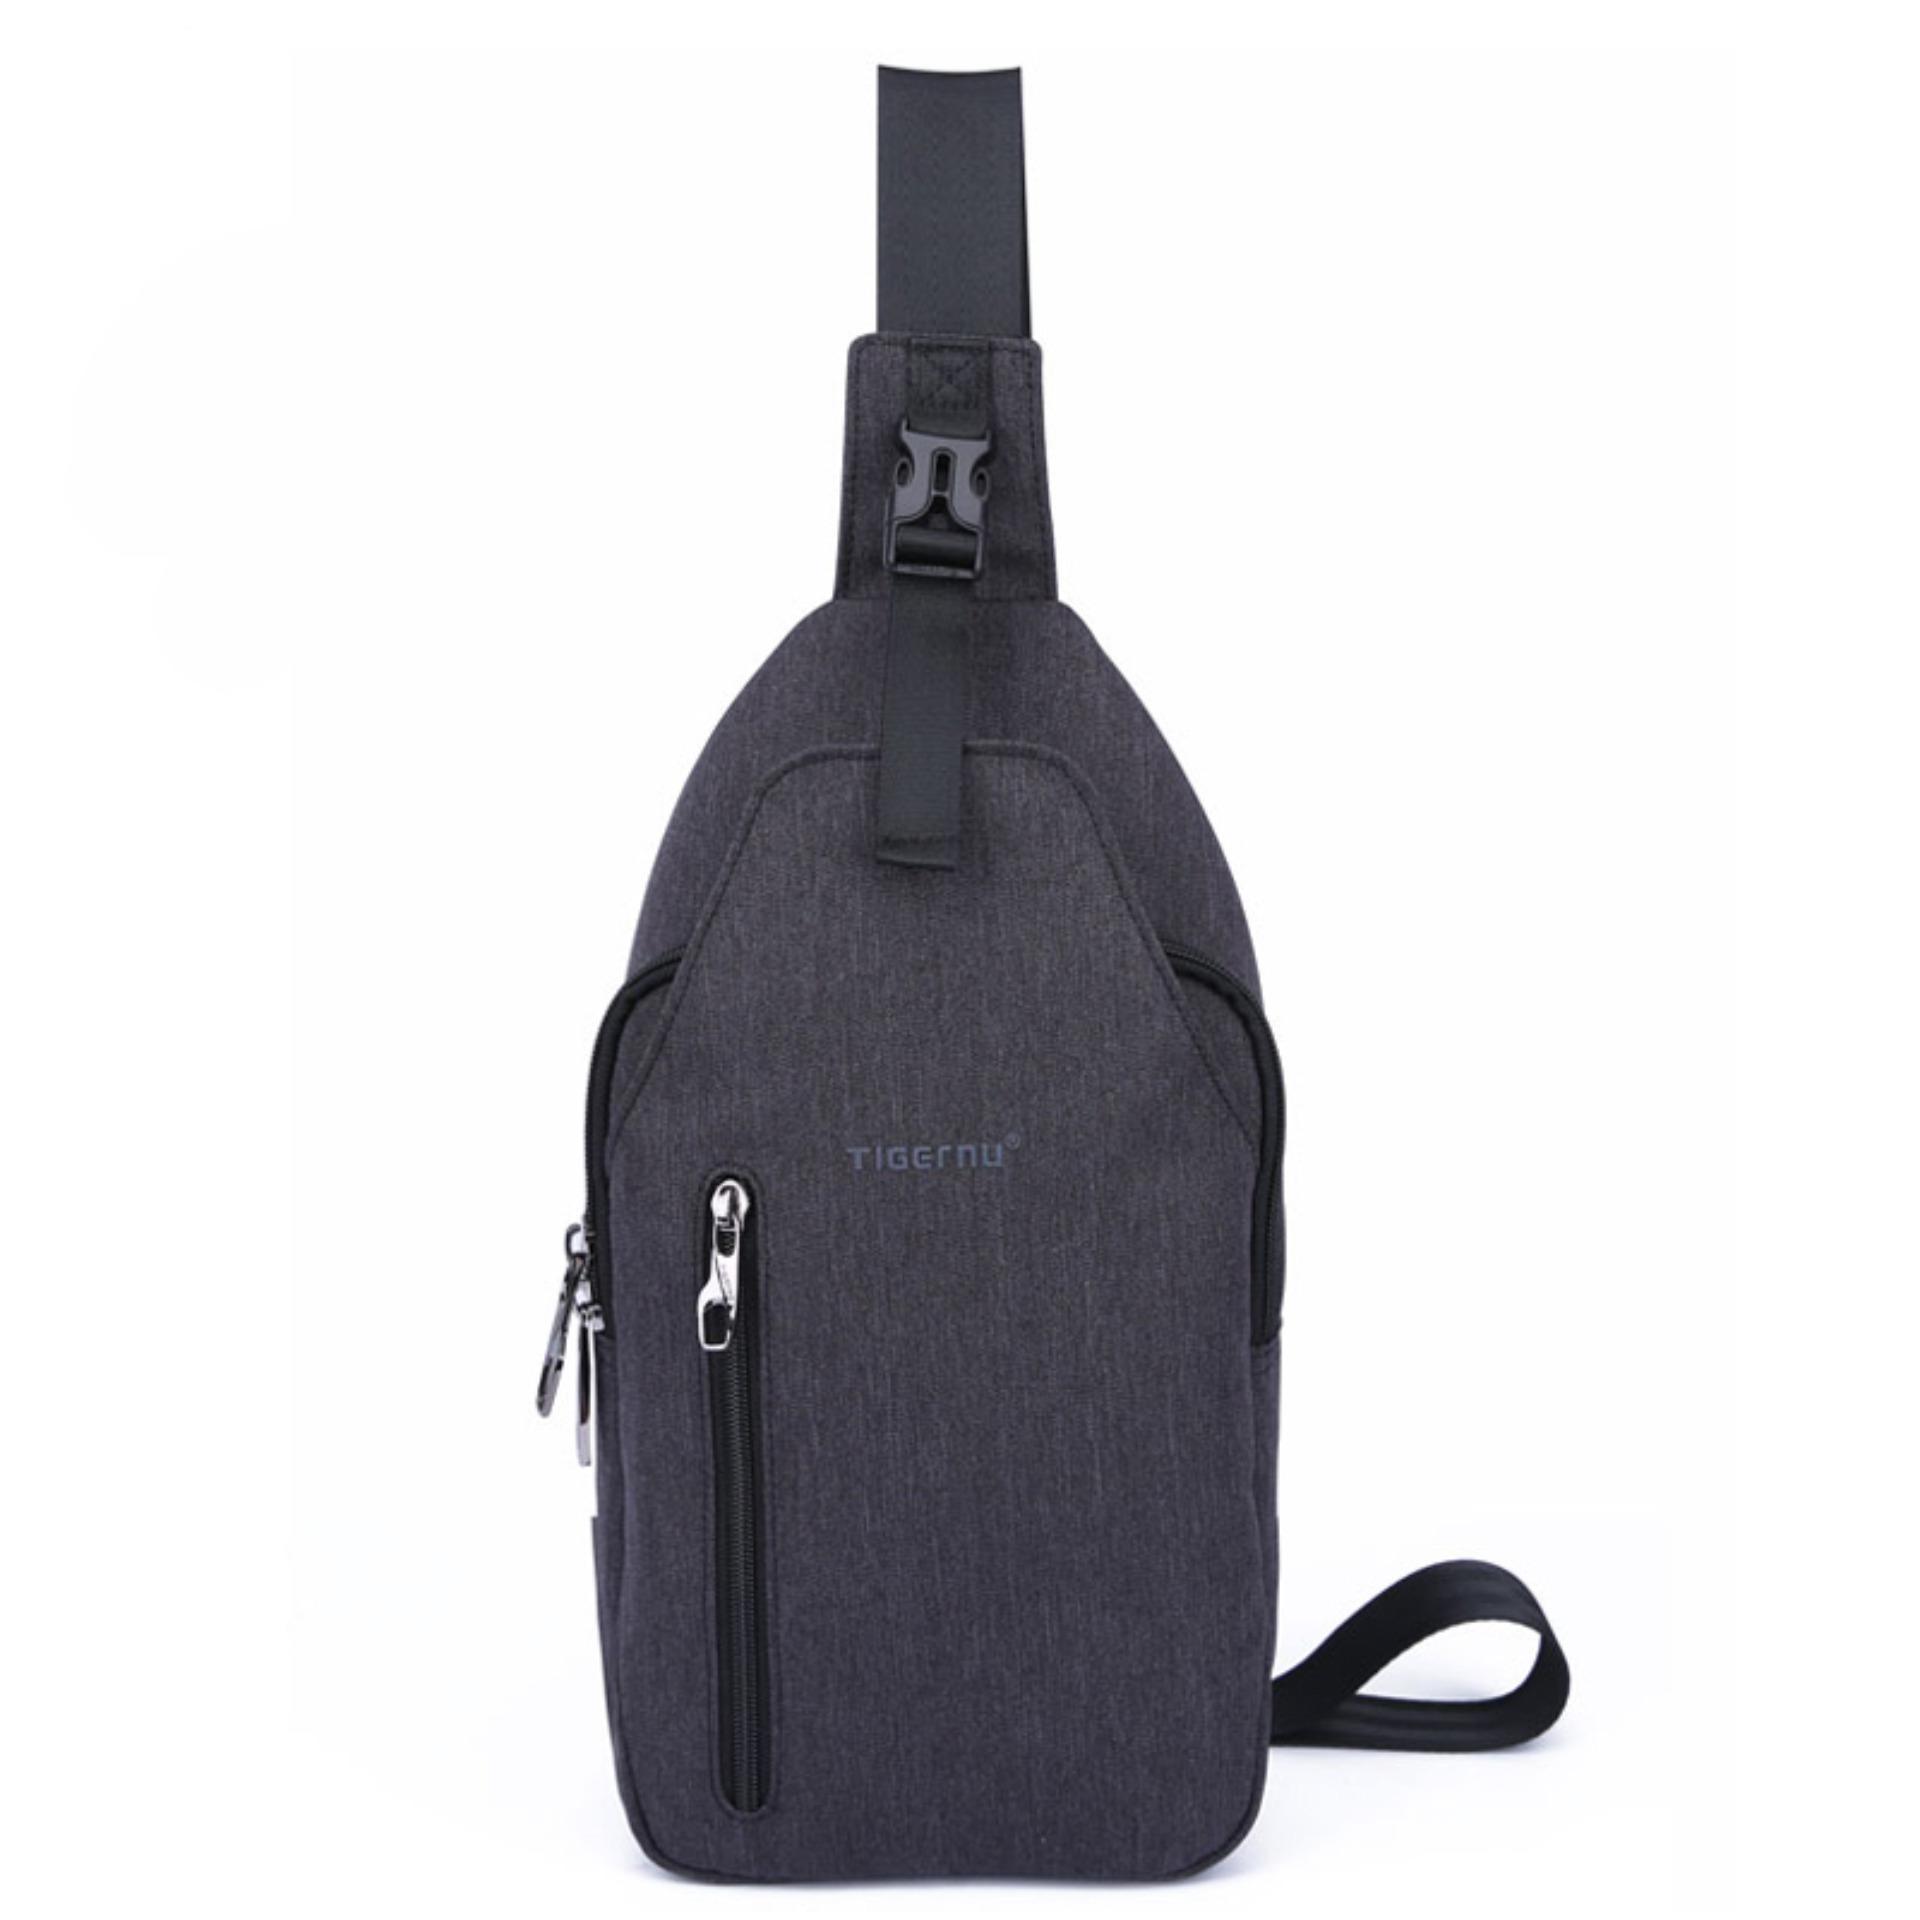 2018 Tigernu Brand Size L Waterproof Oxford Fabric Sling Phone Chest BagT-B8027(Black Grey) - intl Philippines